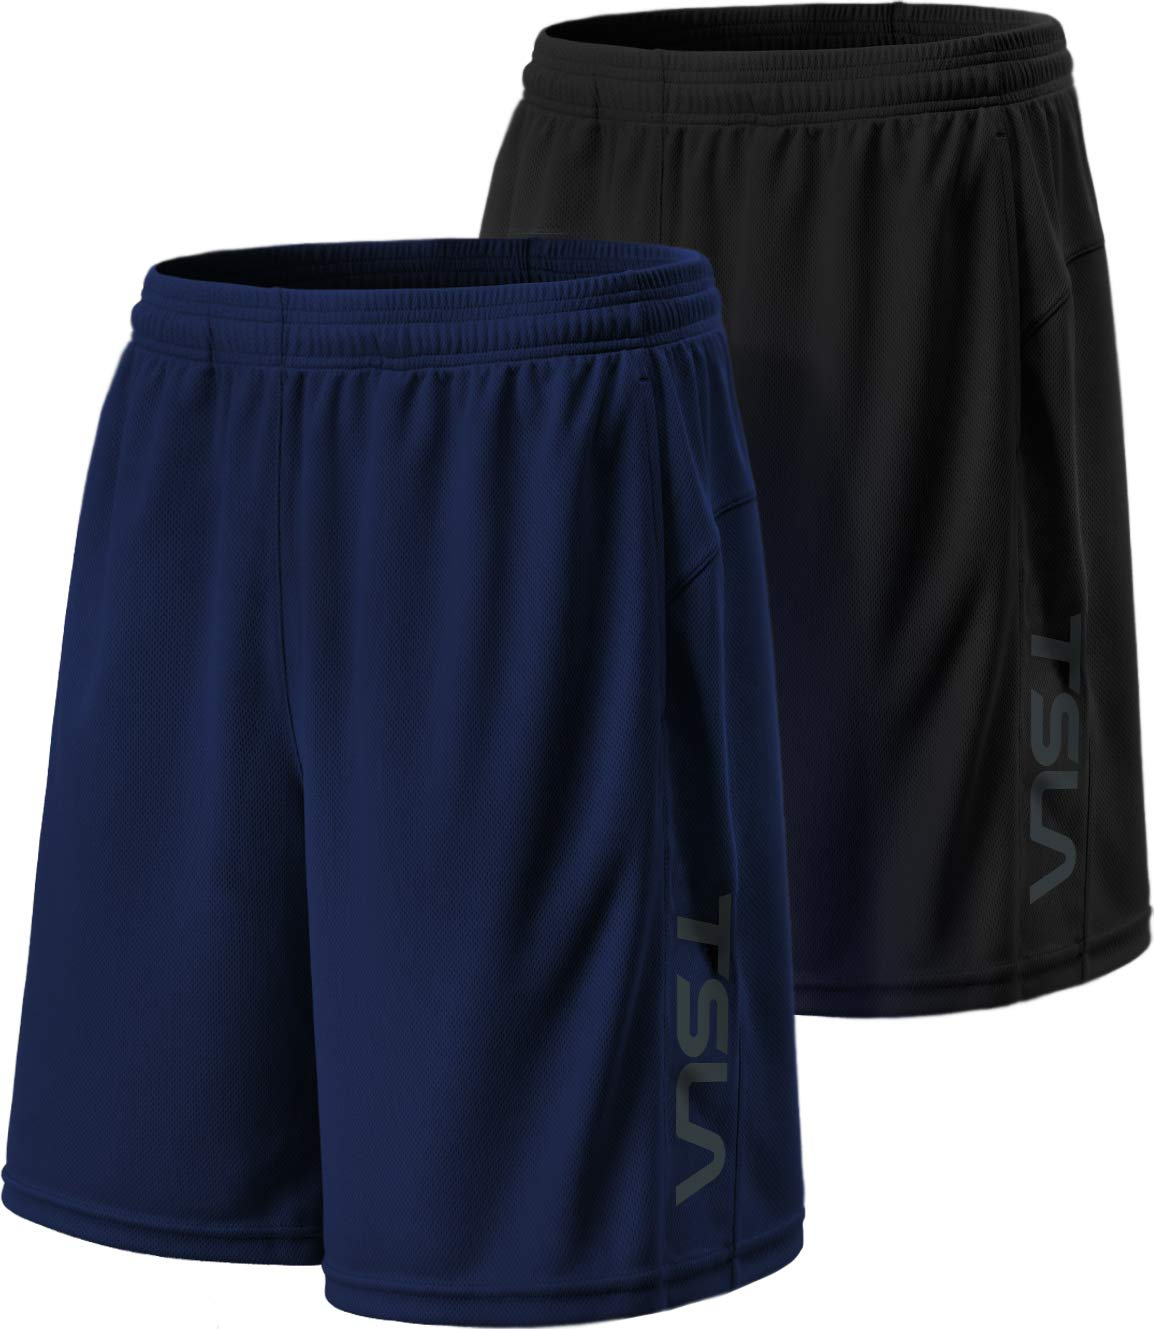 TSLA Men's HyperDri Cool Quick-Dry Active Lightweight Workout Performance Shorts (Pack of 2), Hyper Dri Dual Pack(mbh22) - Black/Navy, X-Small